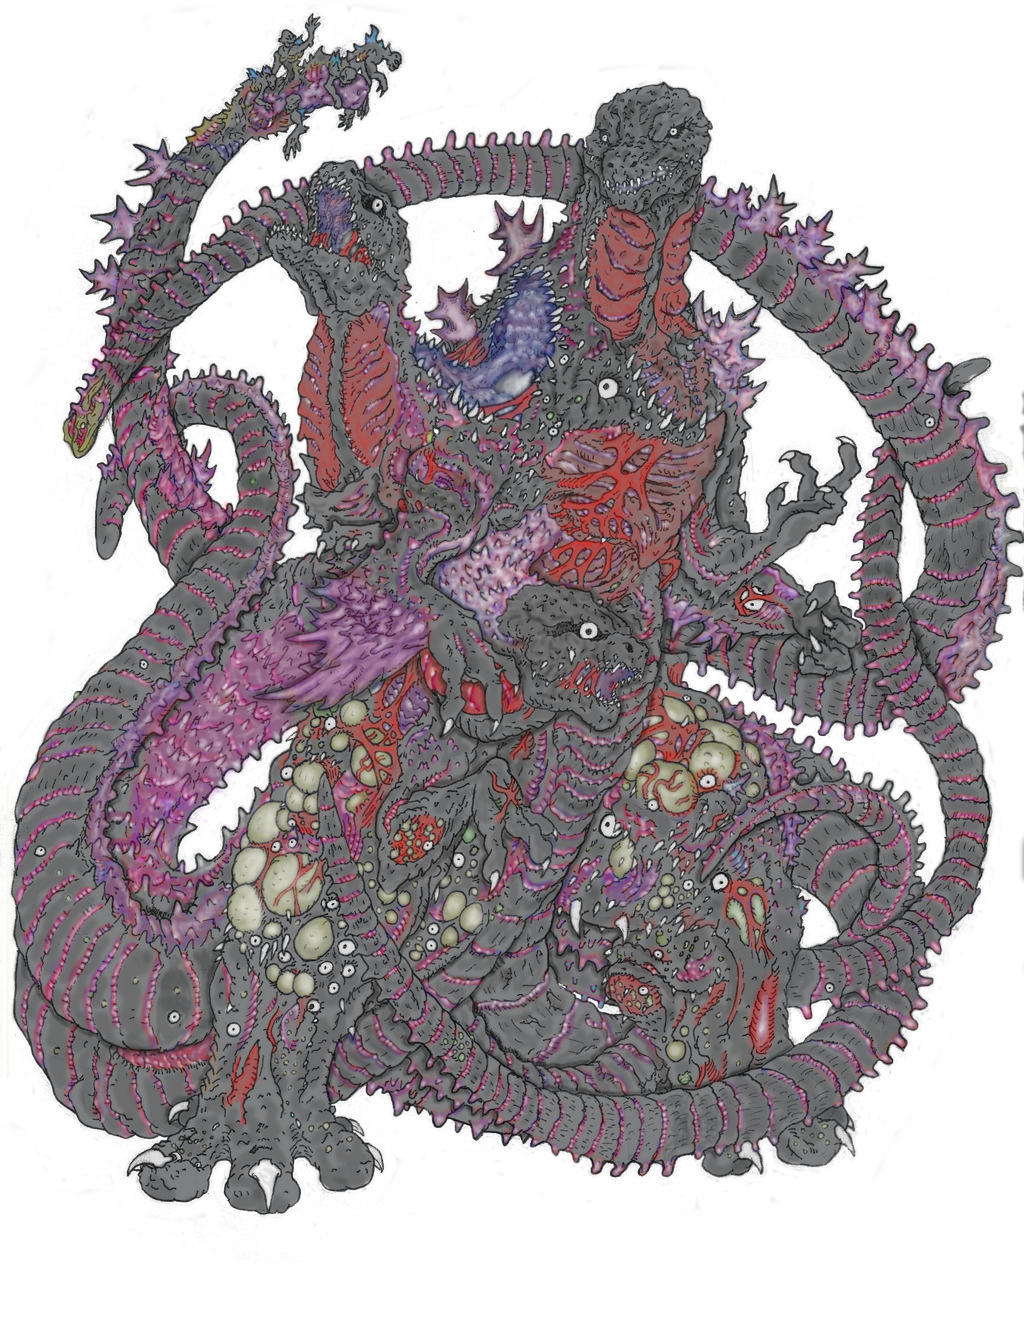 Shin Godzilla Meltdown (Colored) by Beastrider9